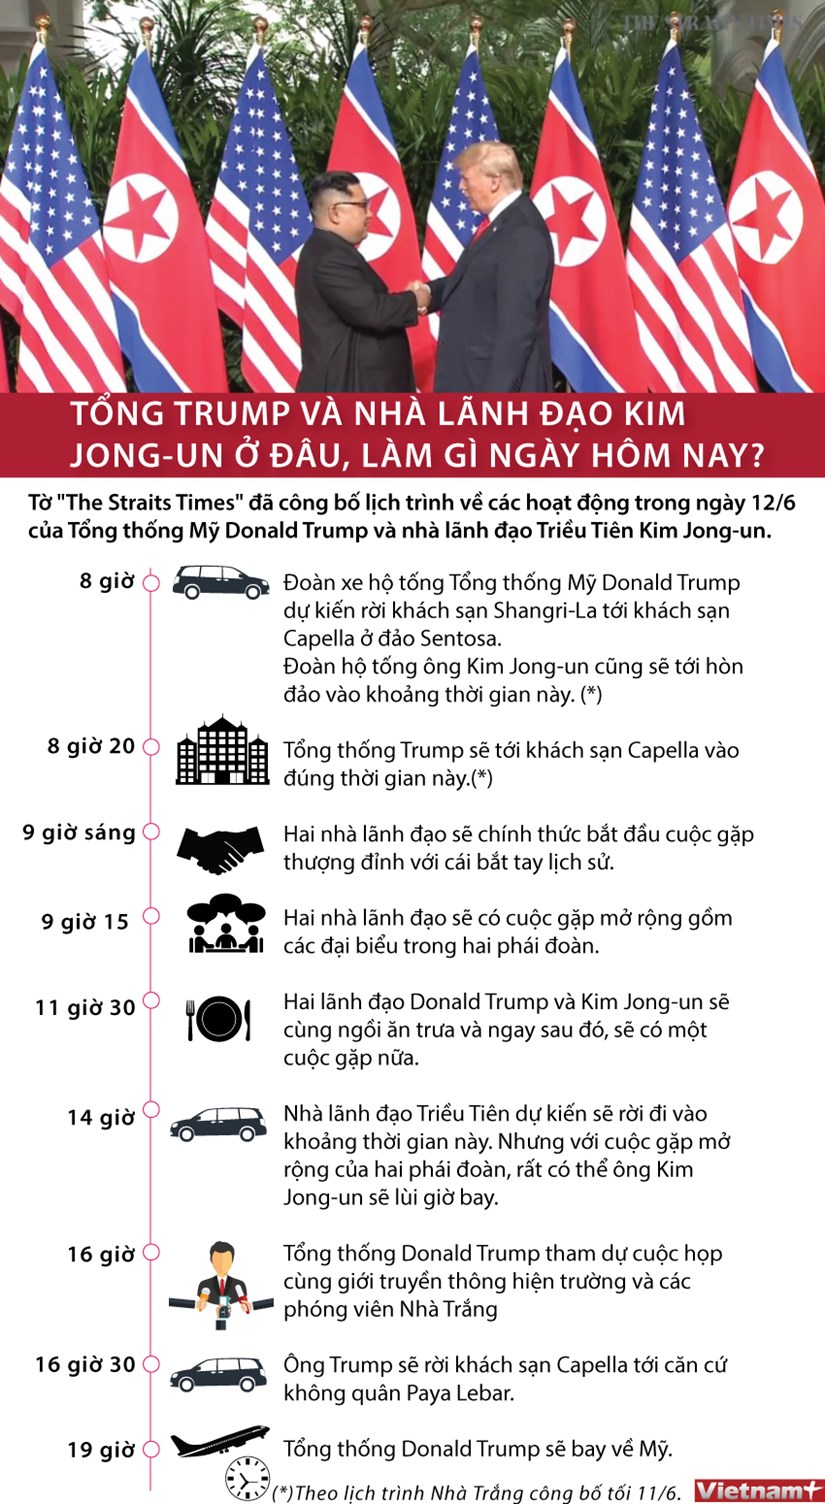 [Infographics] Lich trinh lam viec cua ong Trump va ong Kim Jong-un hinh anh 1